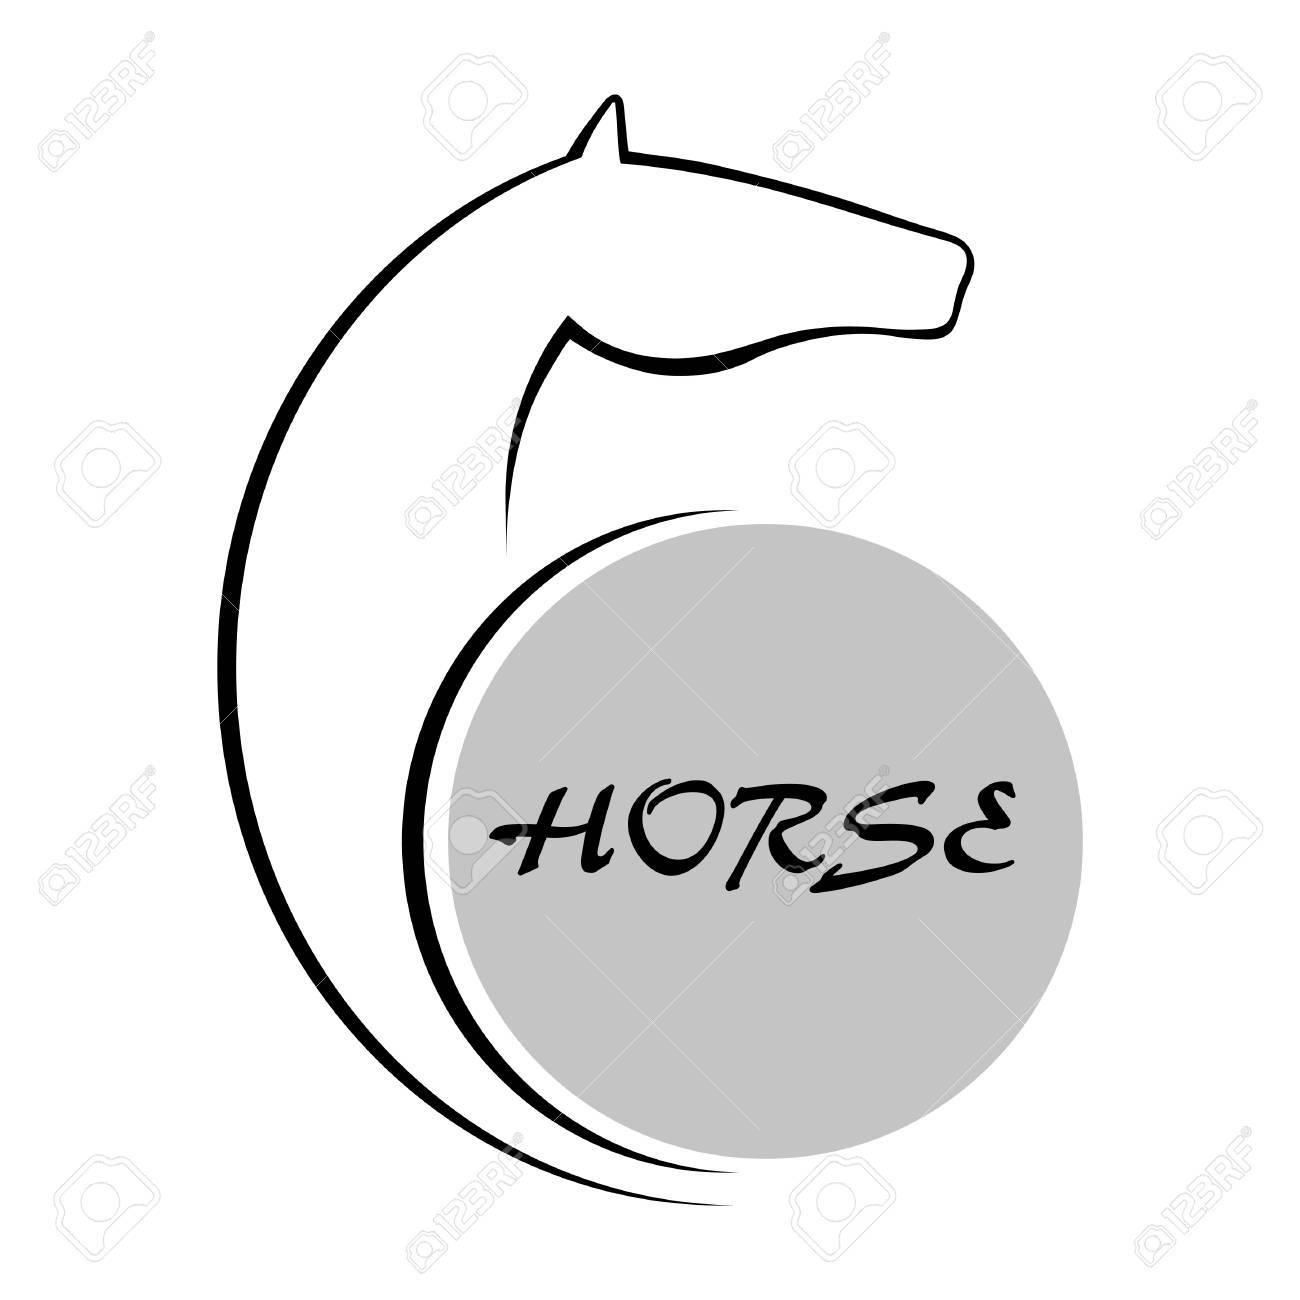 Horse symbol vector royalty free cliparts vectors and stock horse symbol vector stock vector 14064264 buycottarizona